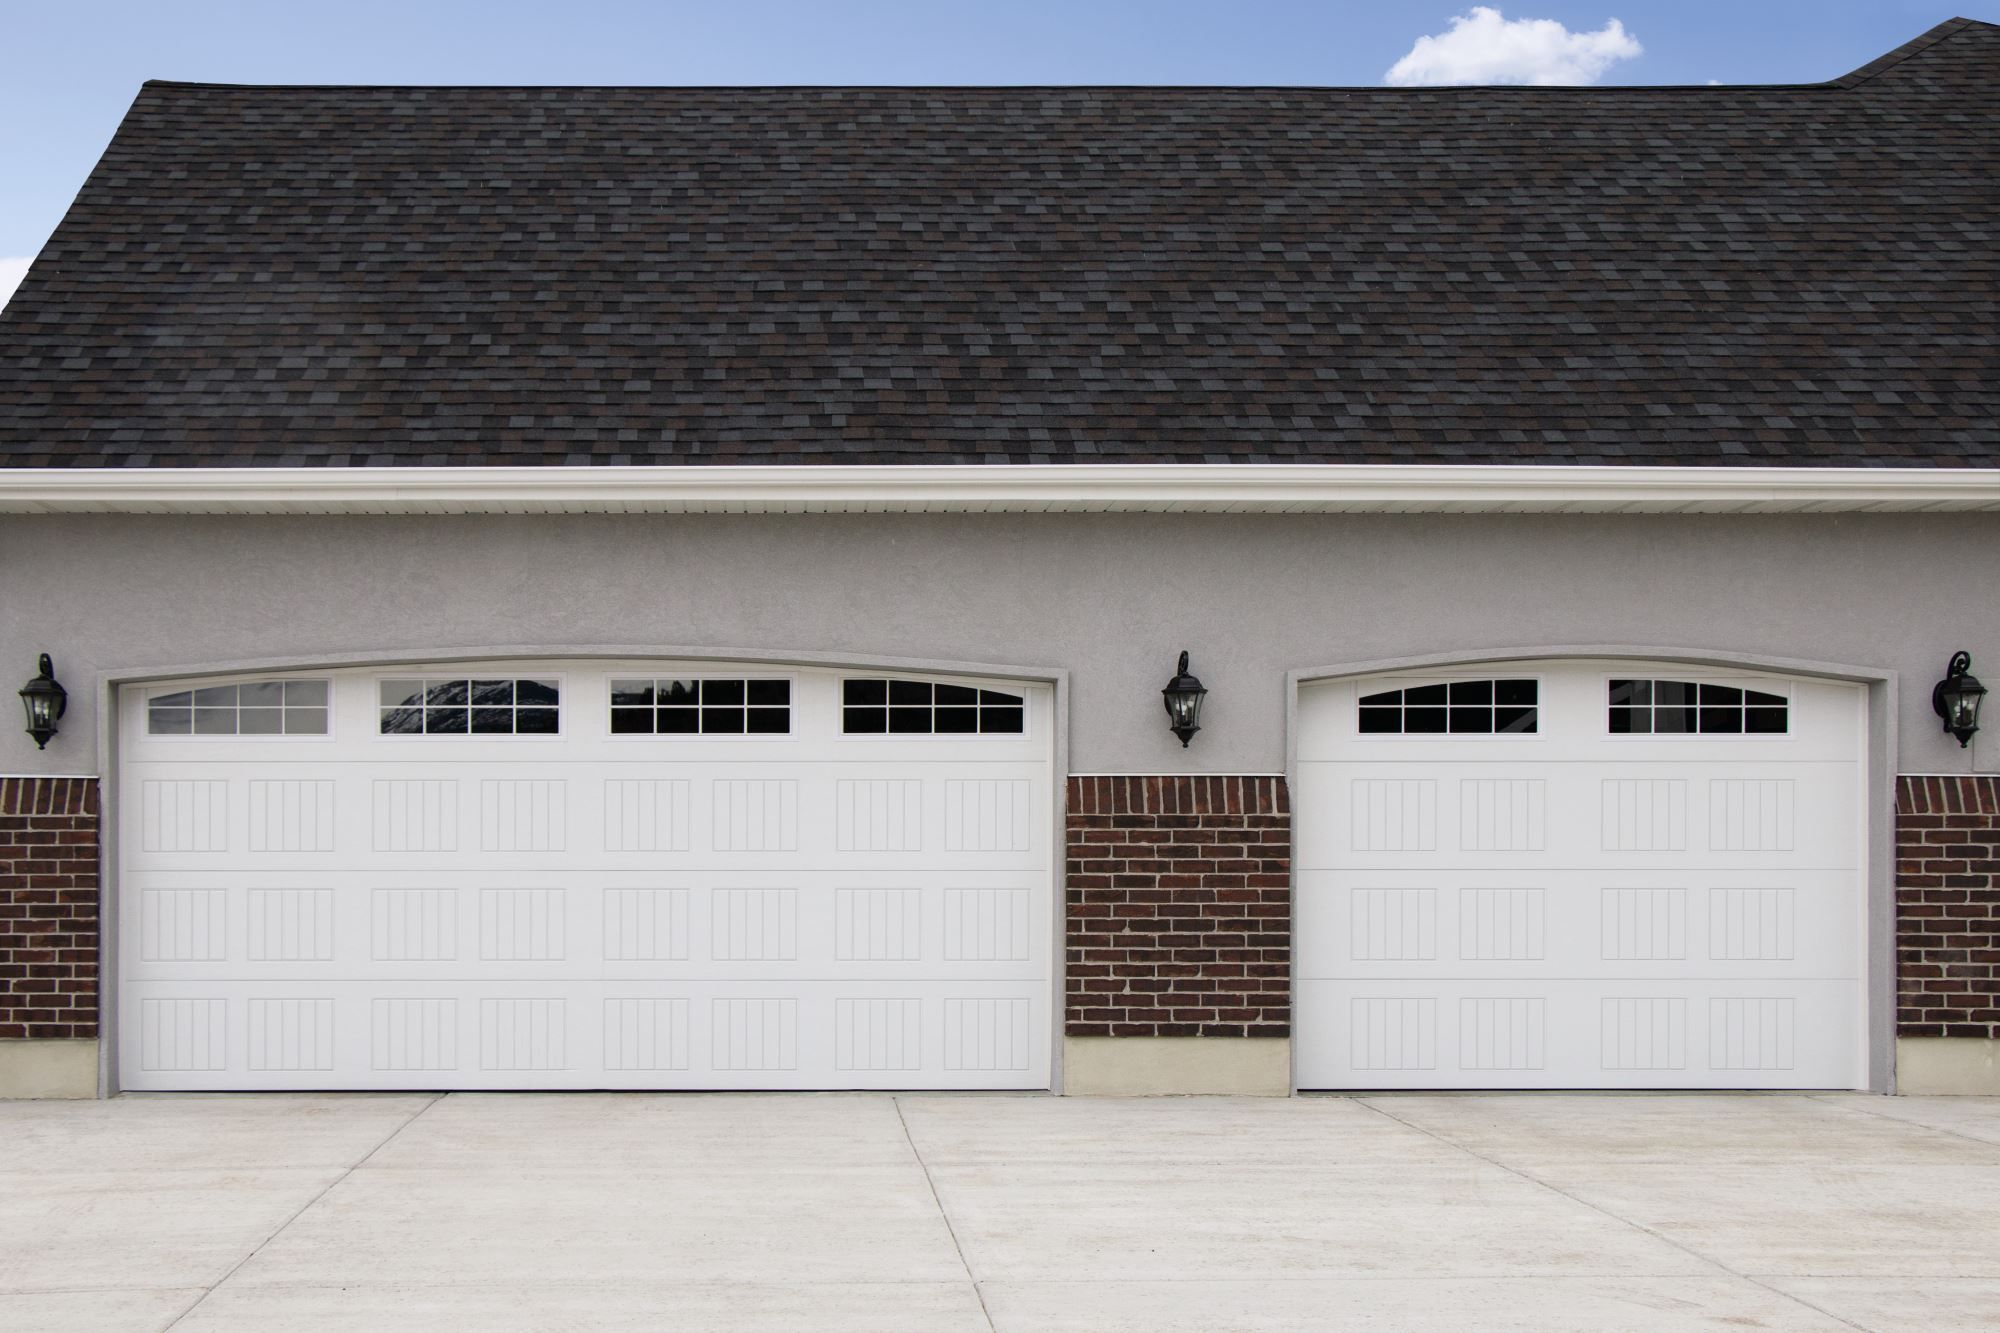 Residential Garage Doors Residential Garage Doors Garage Door Design Garage Doors